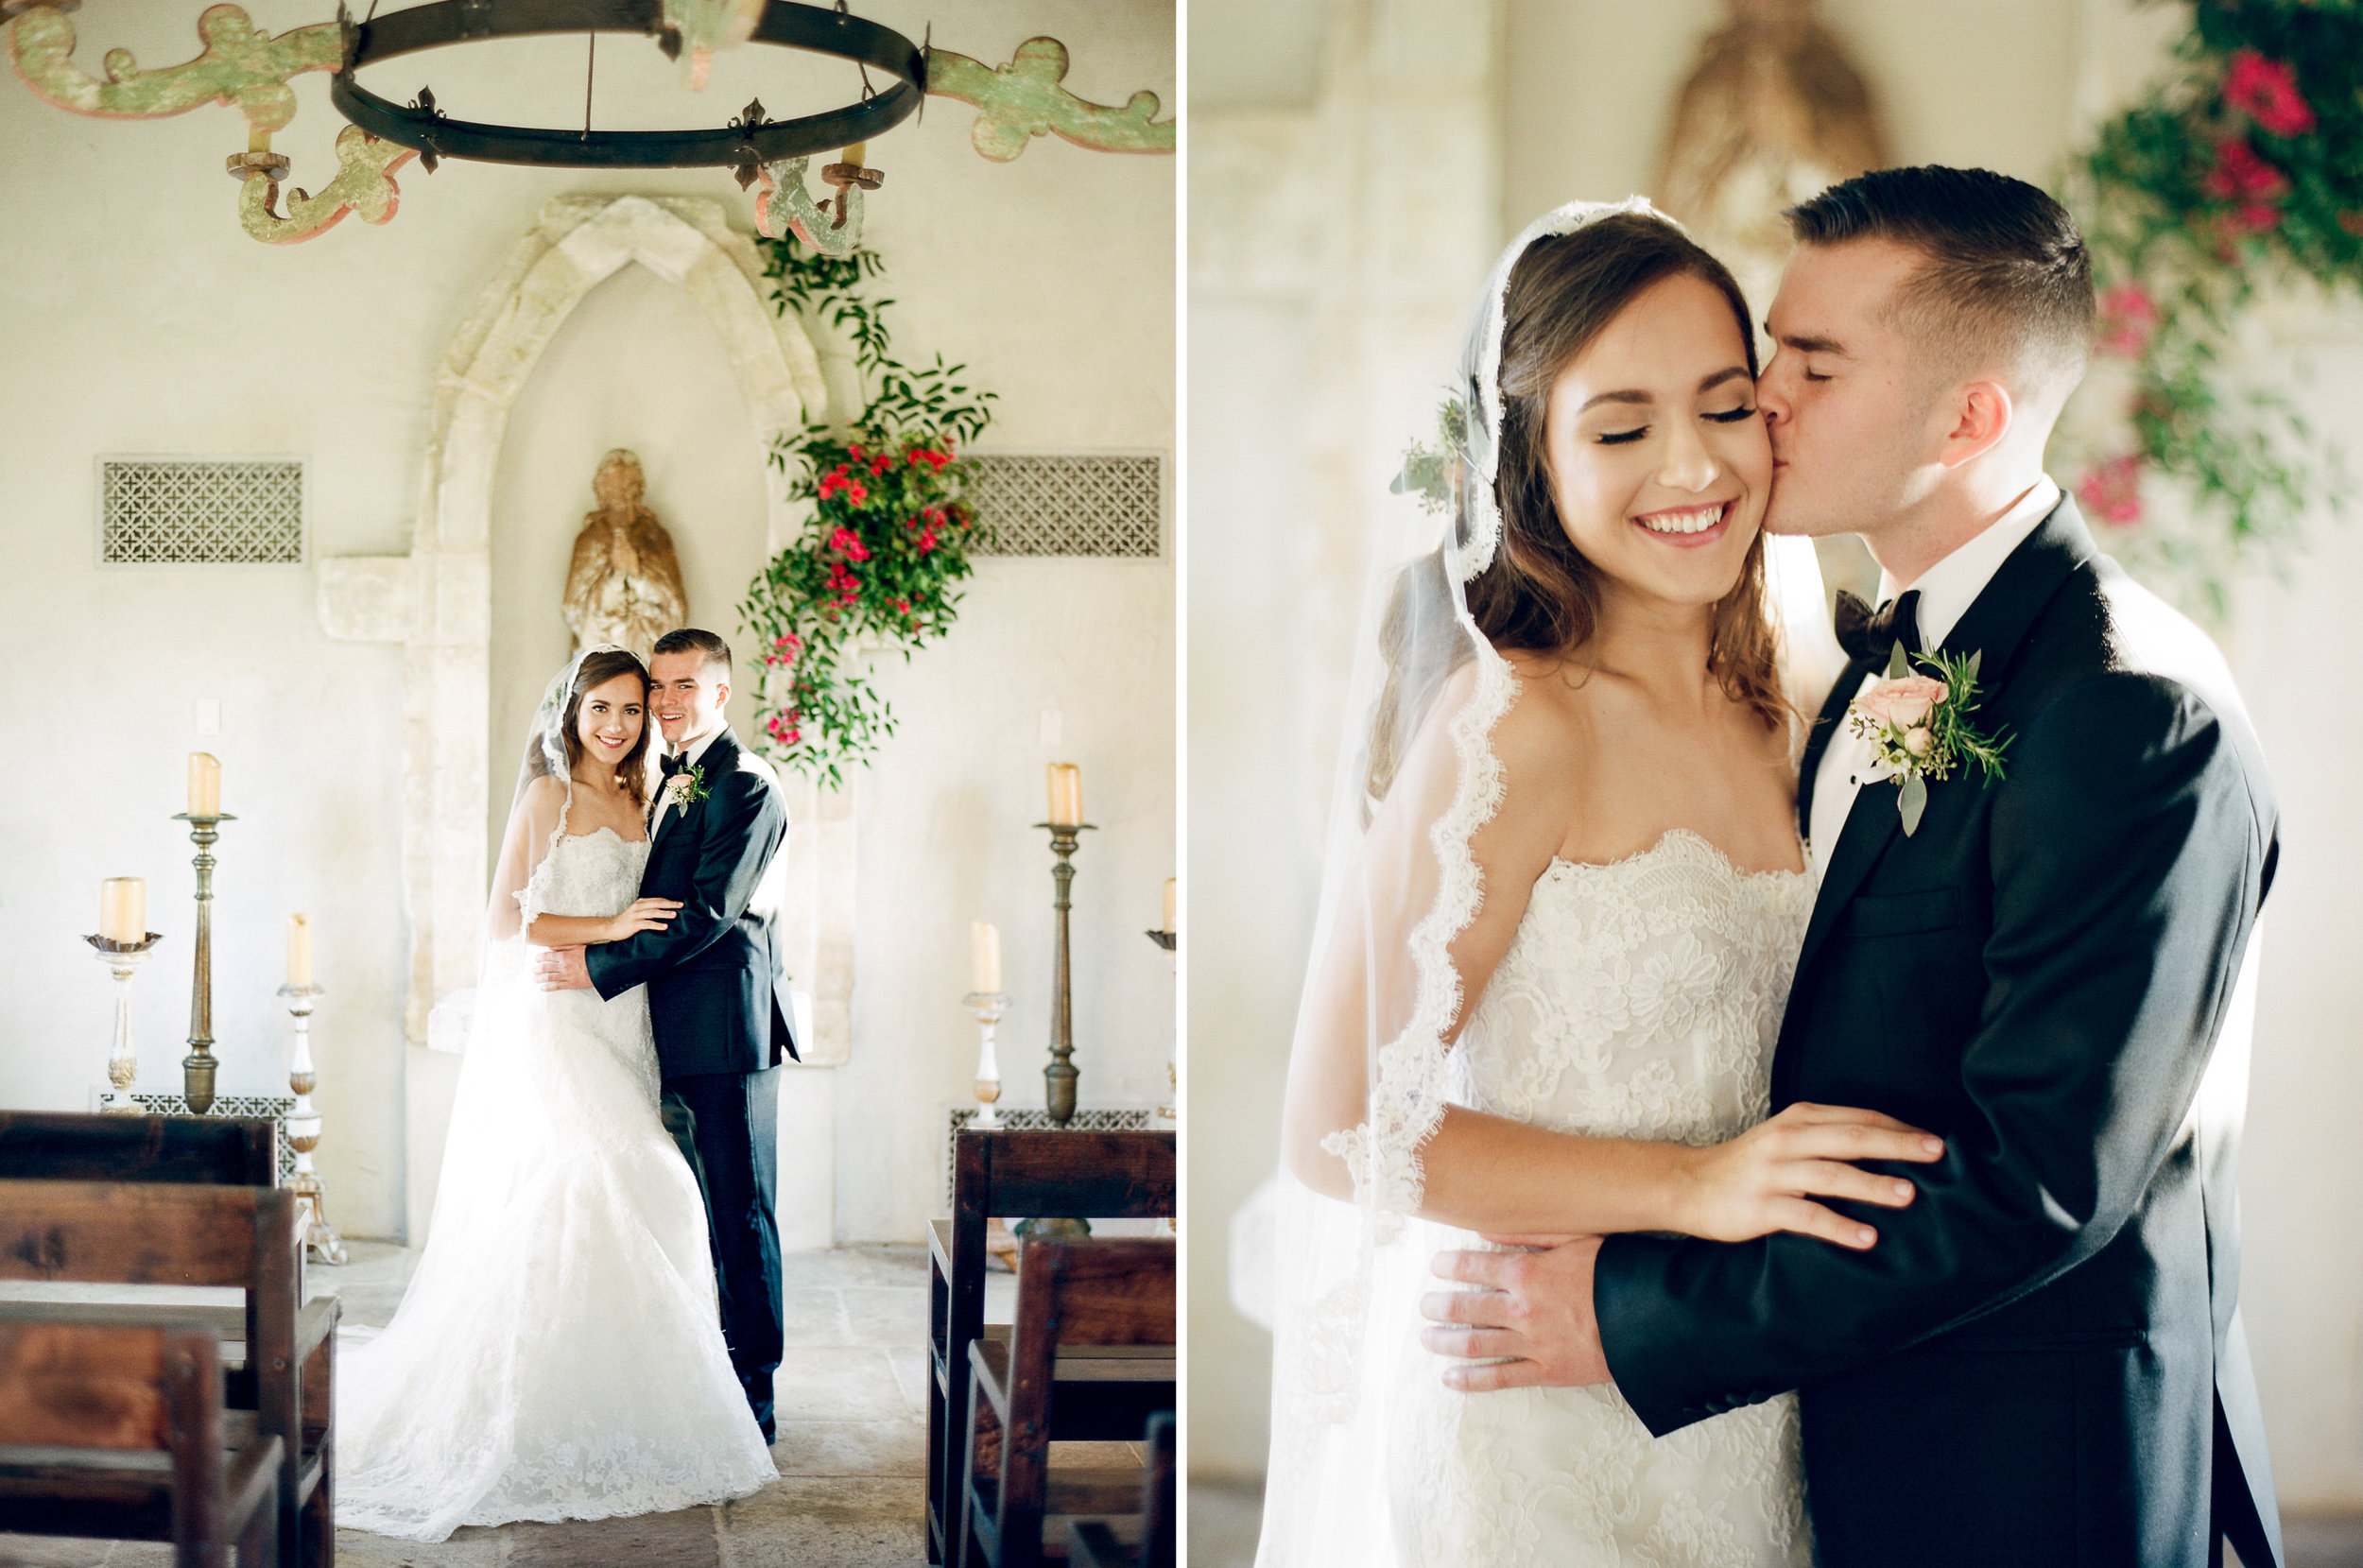 Top-Houston-Wedding-Photographer-Dana-Fernandez-Photography-The-Clubs-At-Houston-Oaks-Country-Club-Belle-Events-Film-Fine-Art-Destination-108.jpg